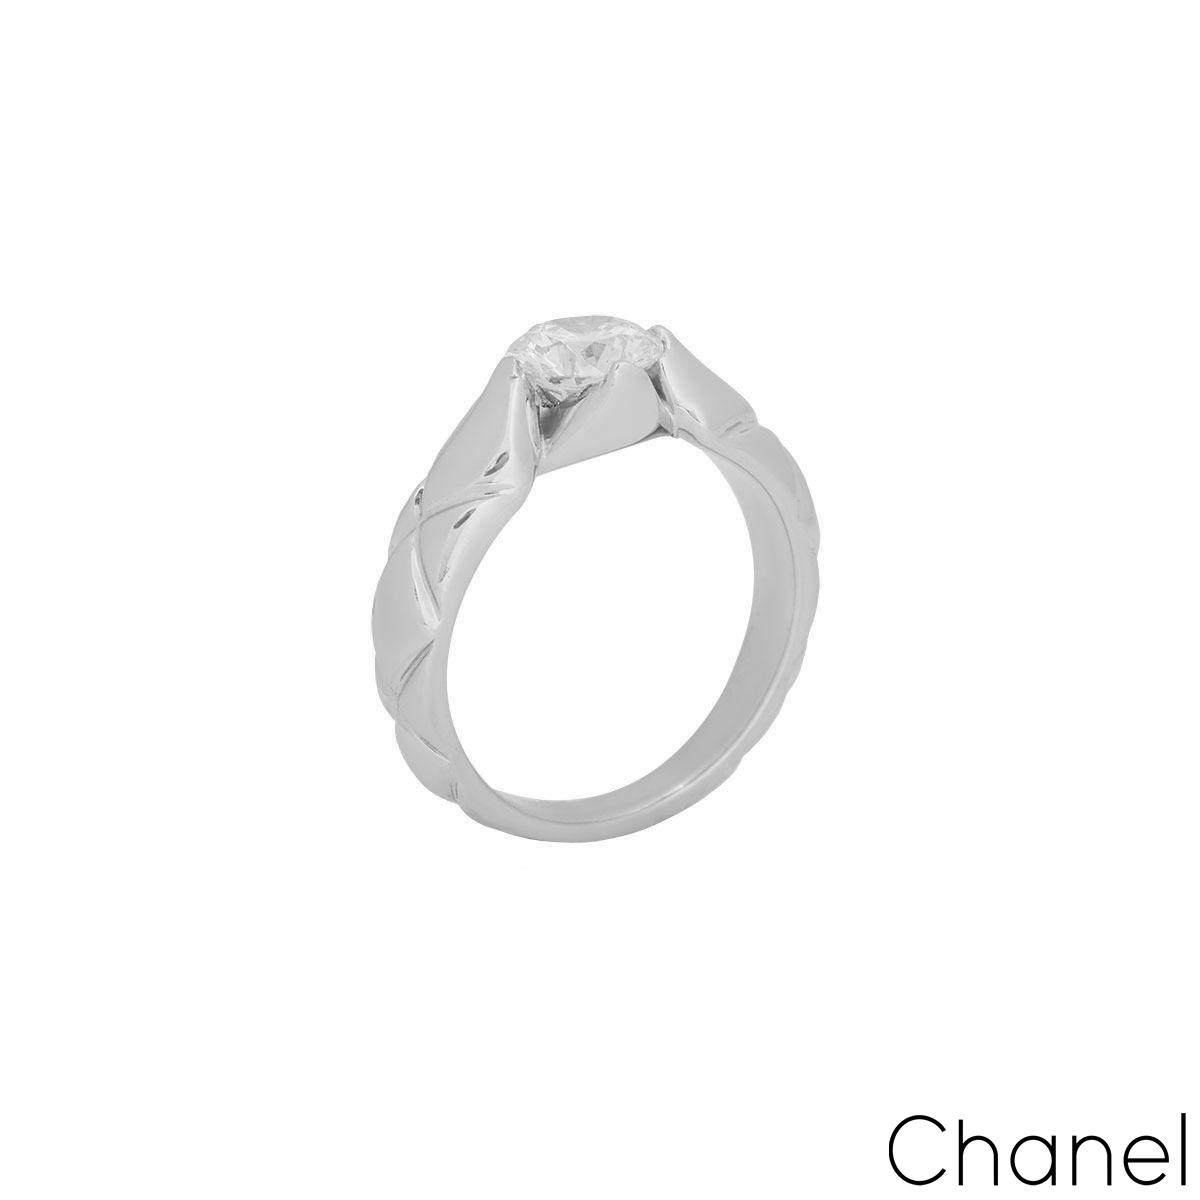 Chanel Platinum Diamond Coco Crush Ring 1.03ct F/VS1